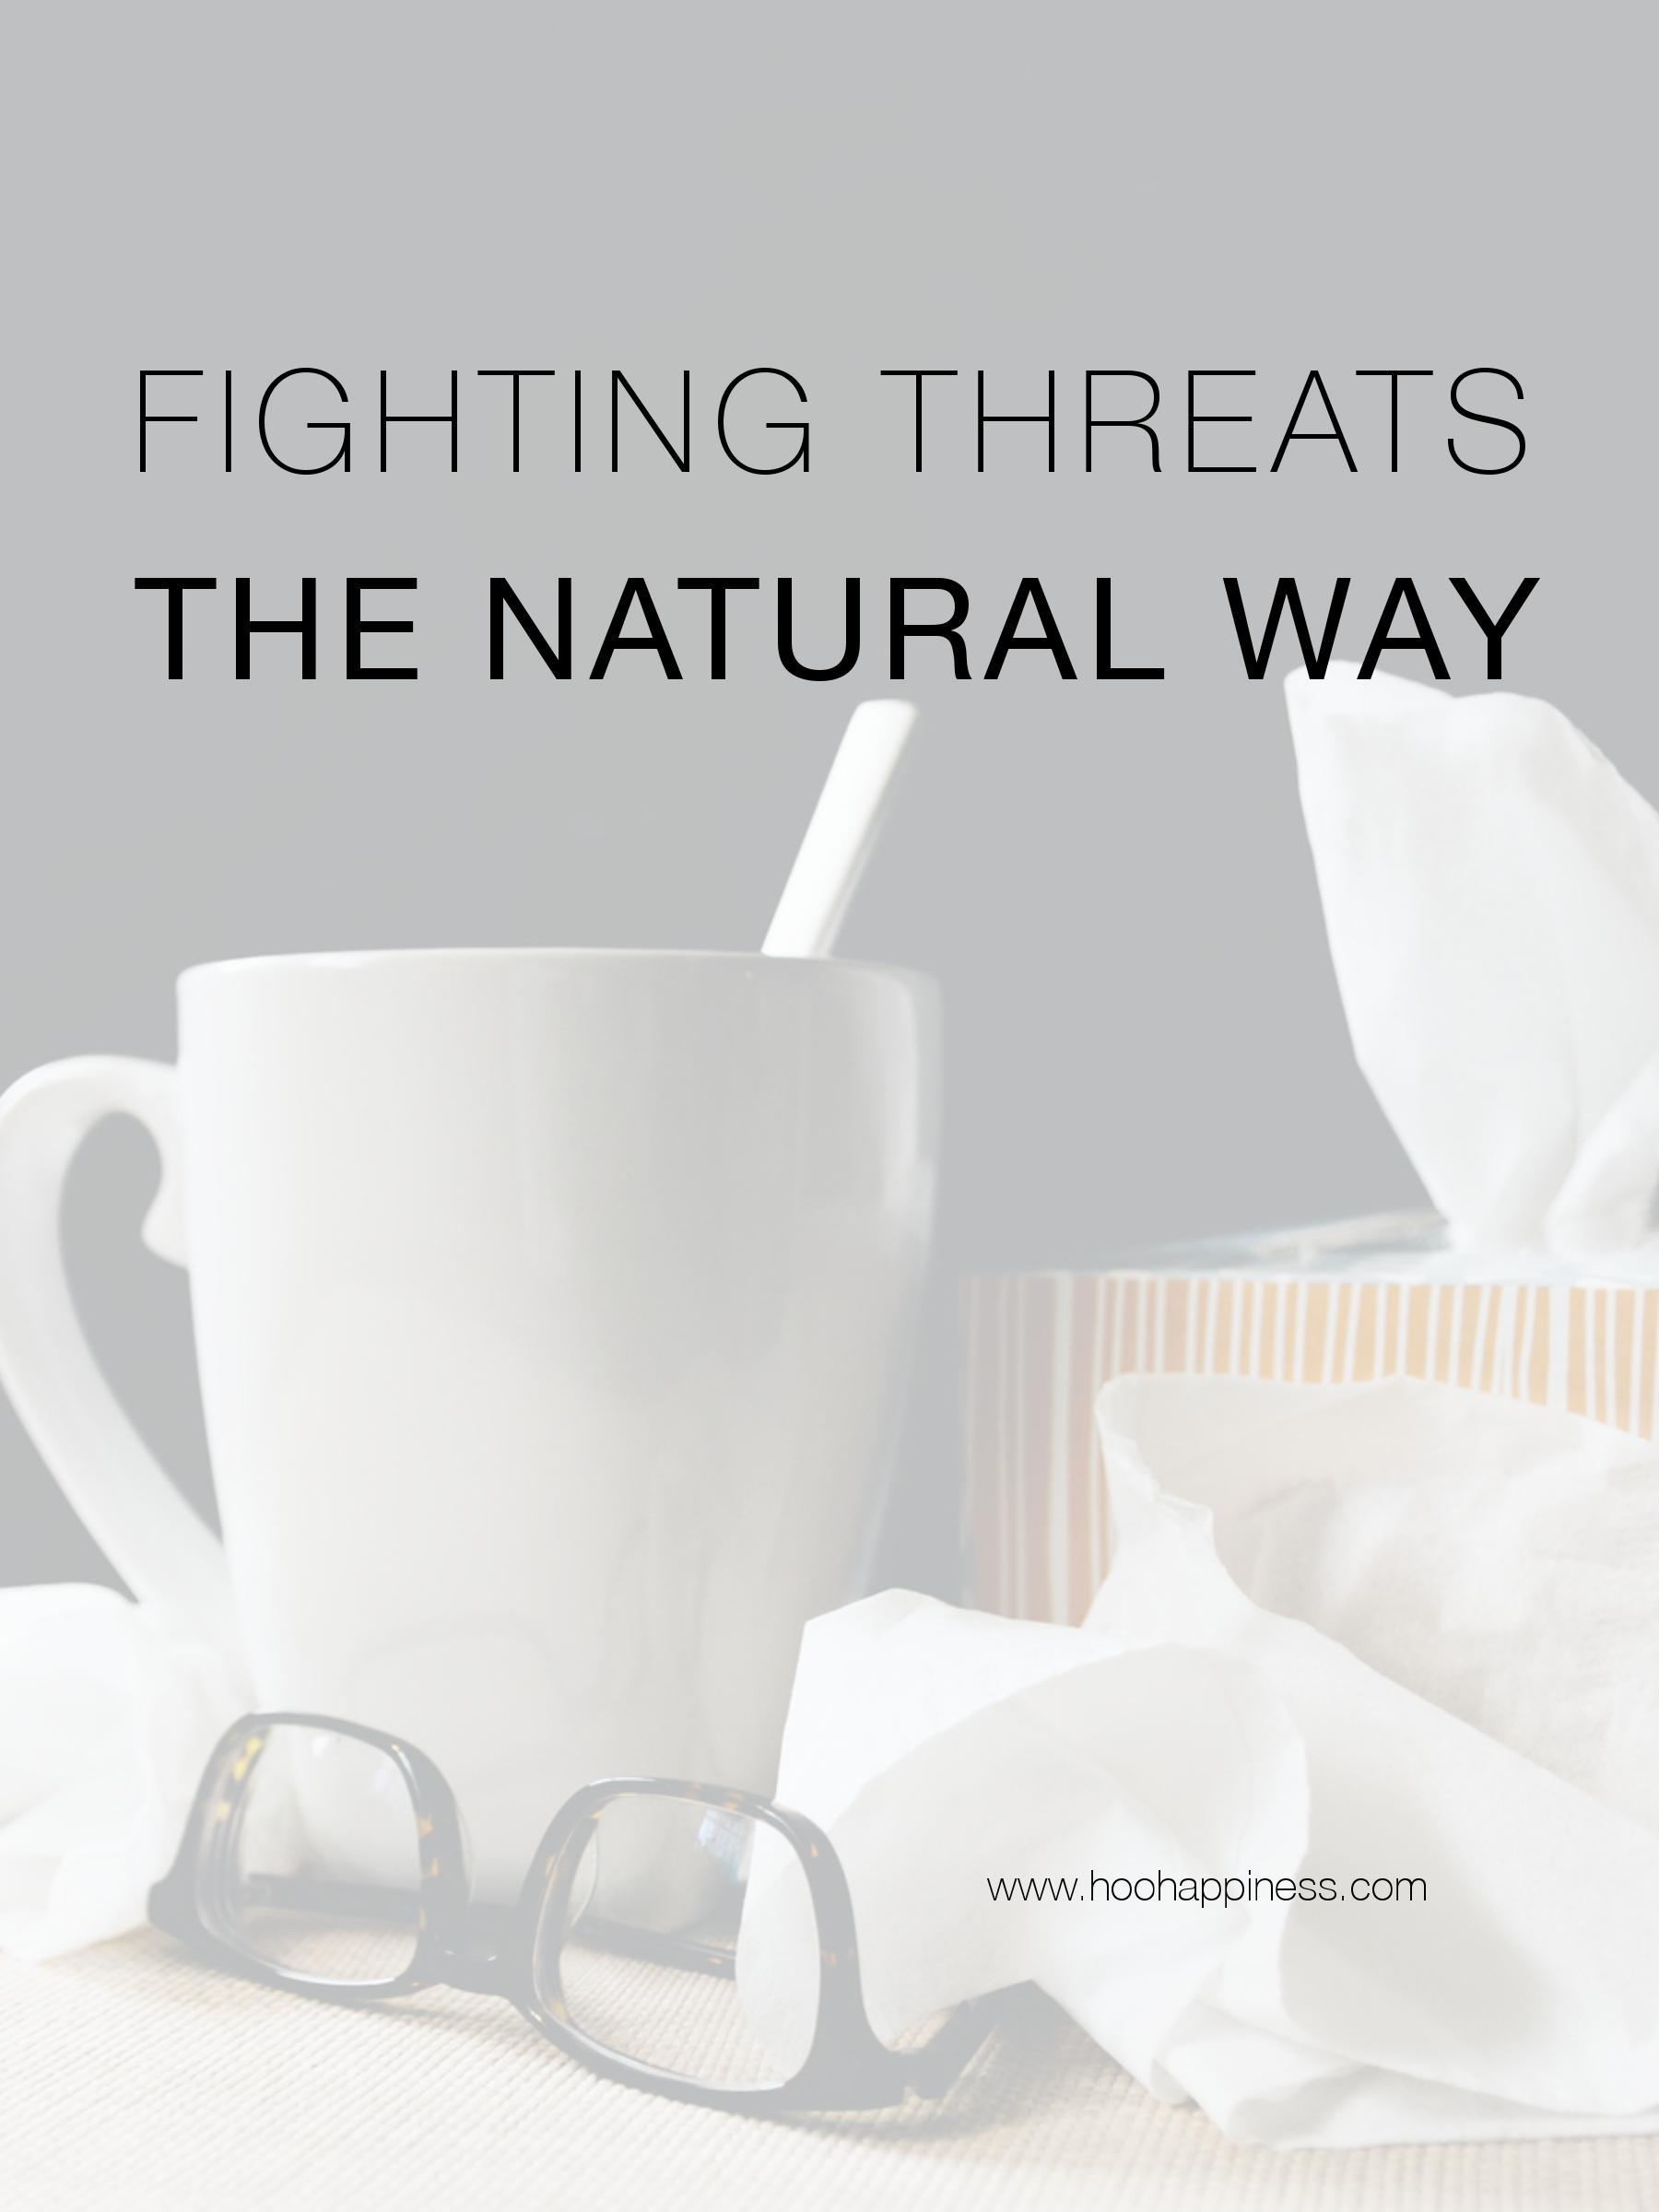 Fighting winter threats naturally